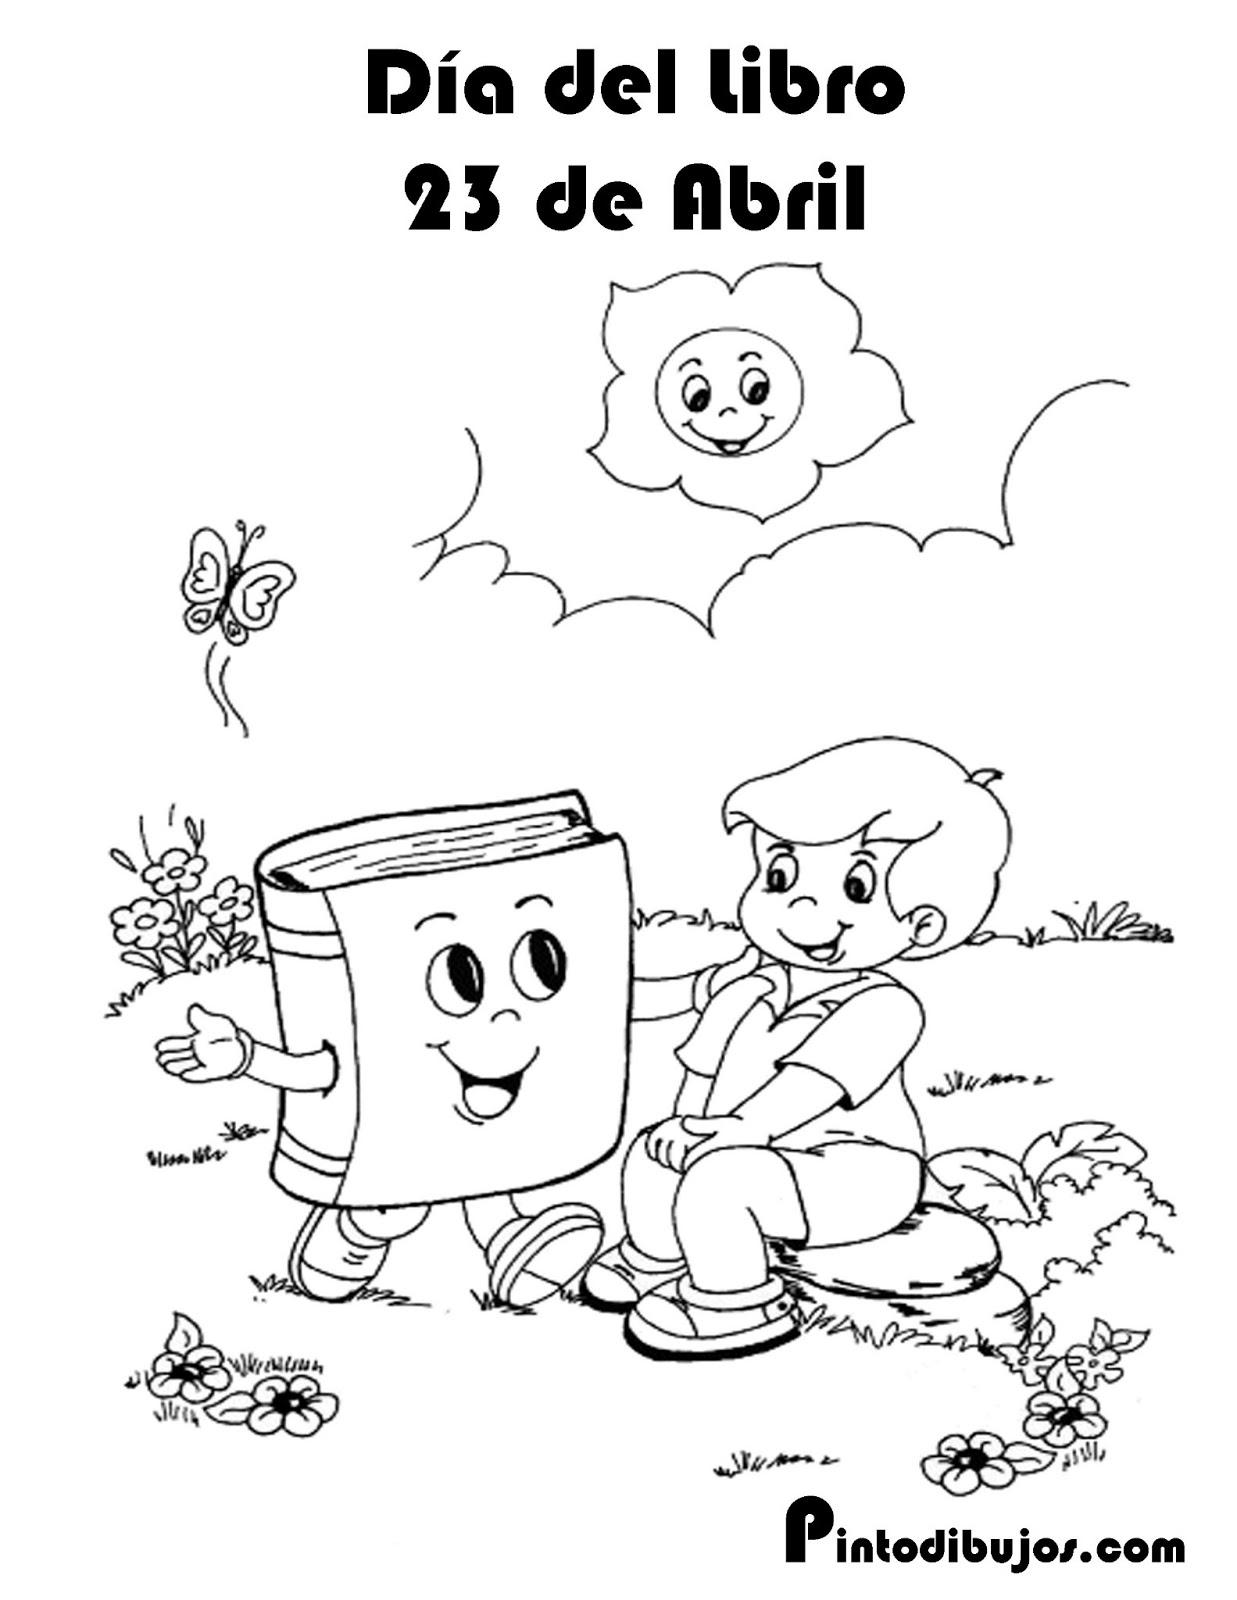 D a del libro para colorear 23 de abril para imprimir